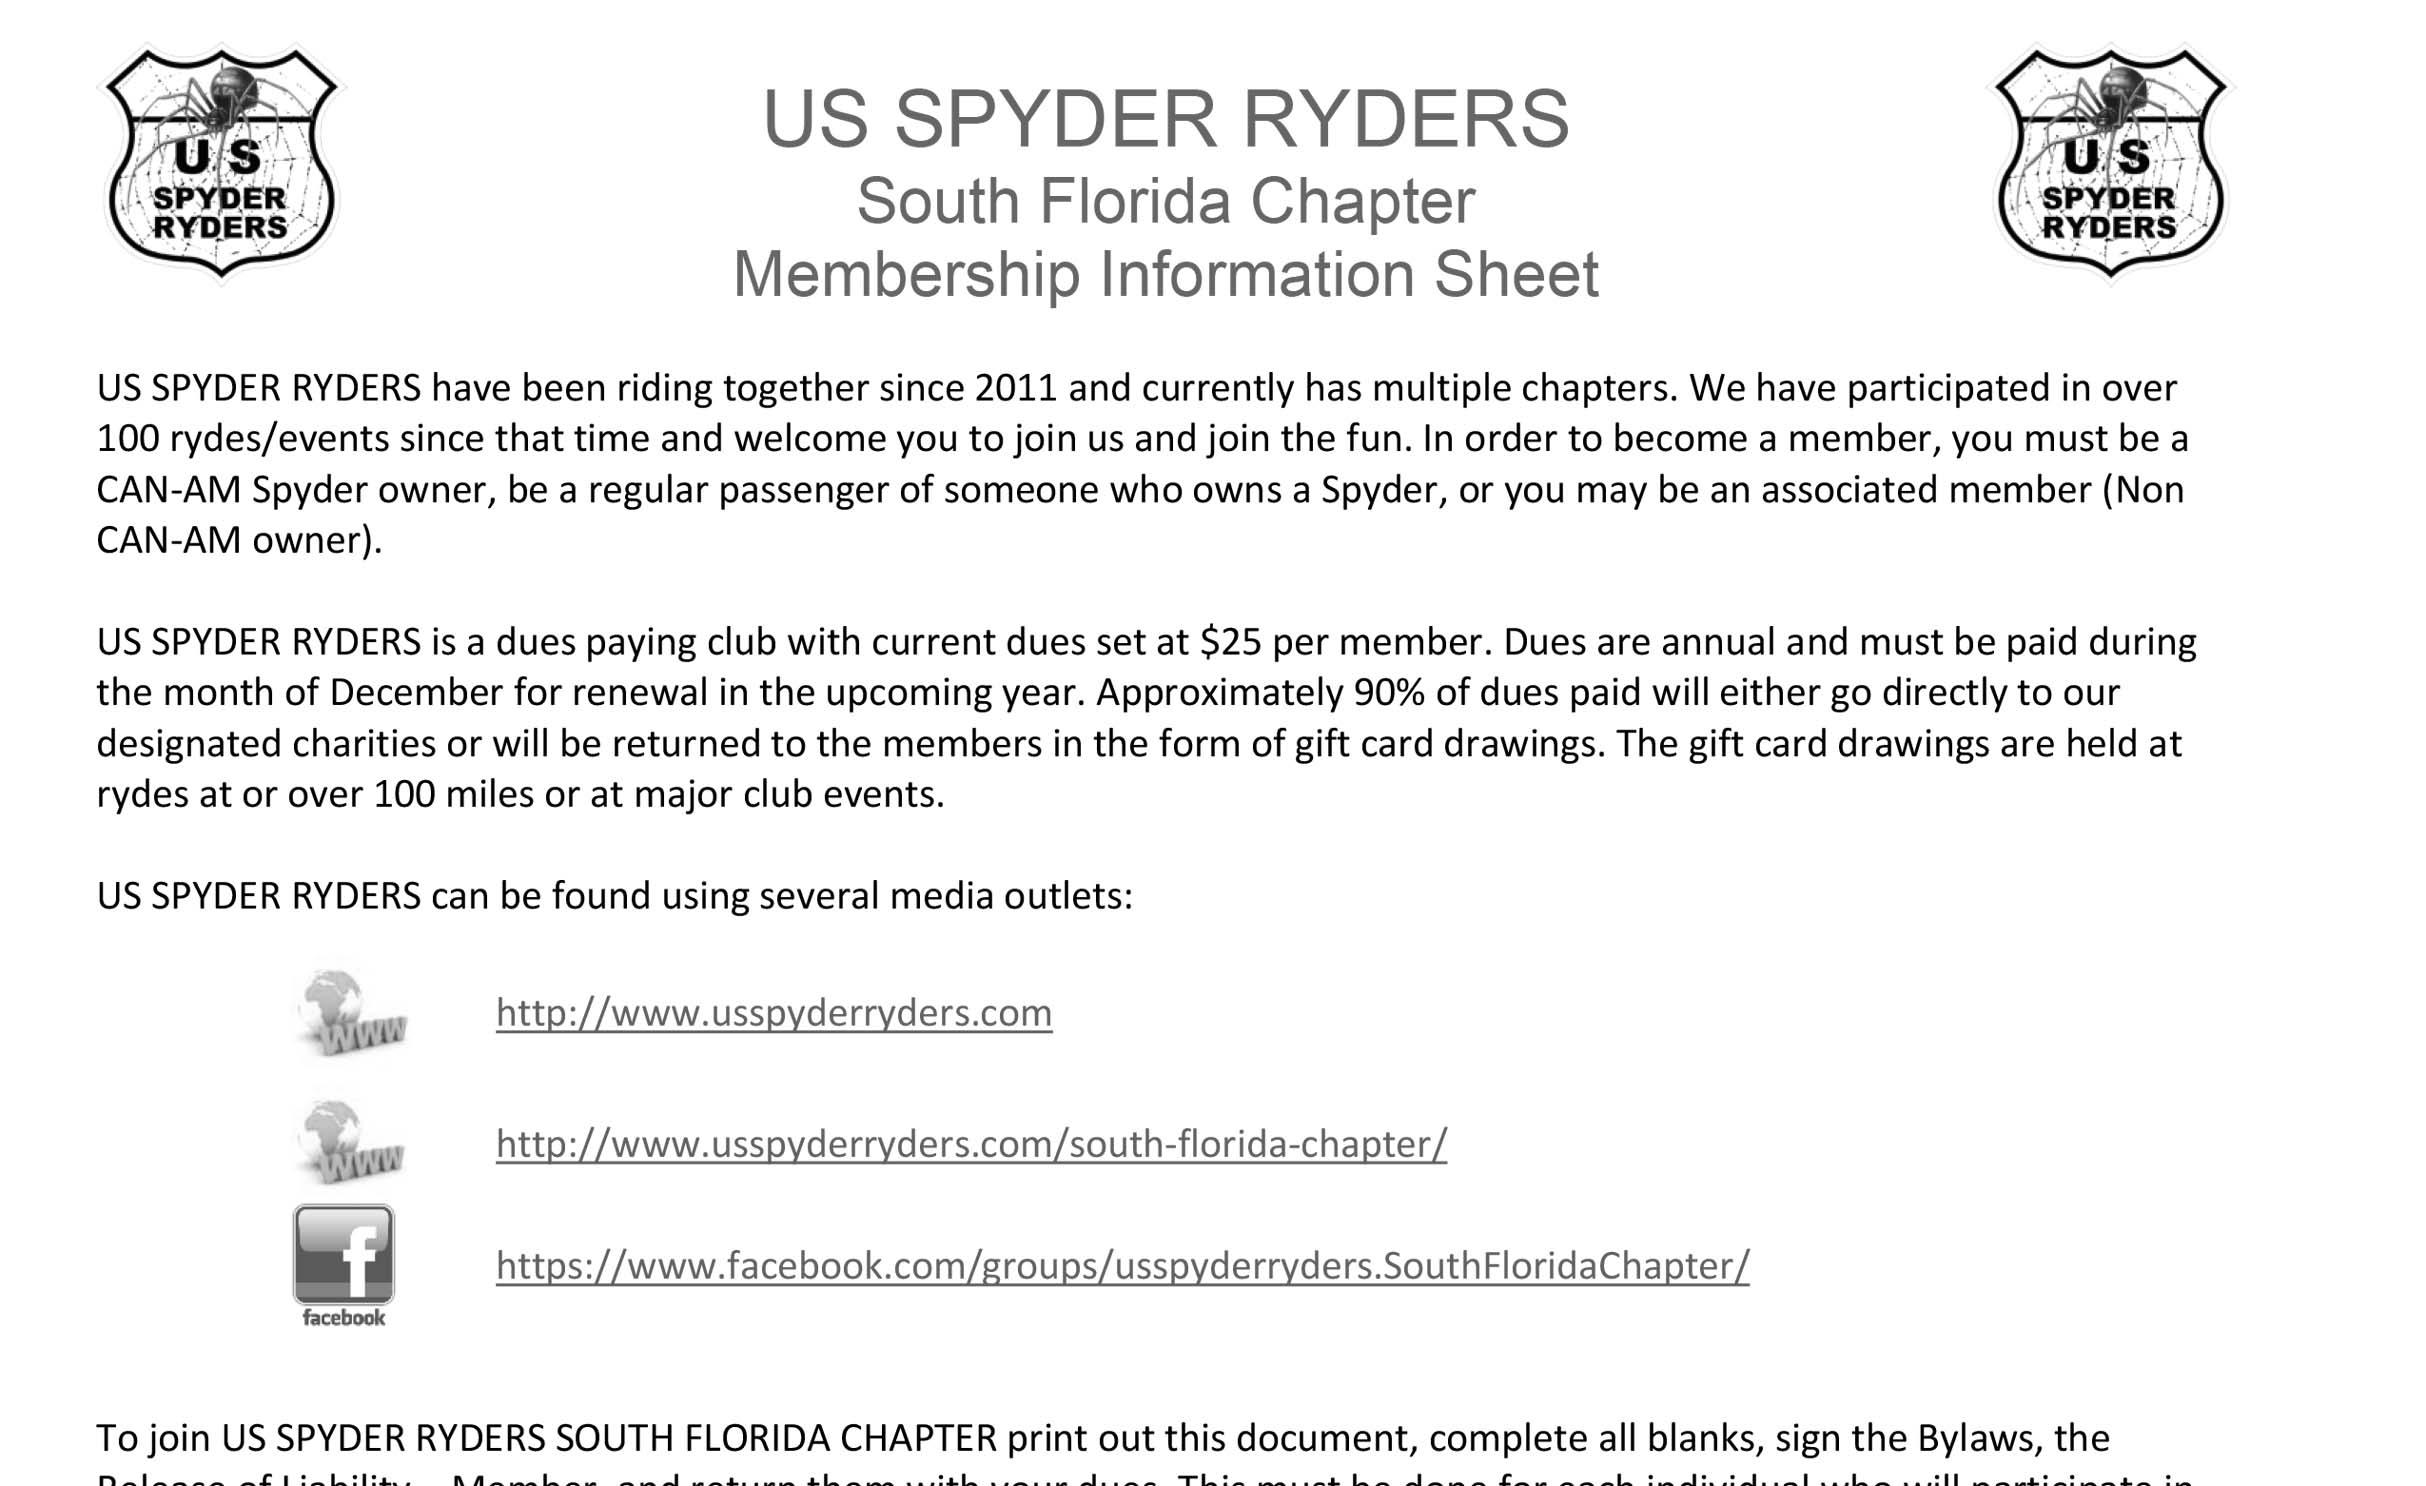 South Florida Chapter Membership Information